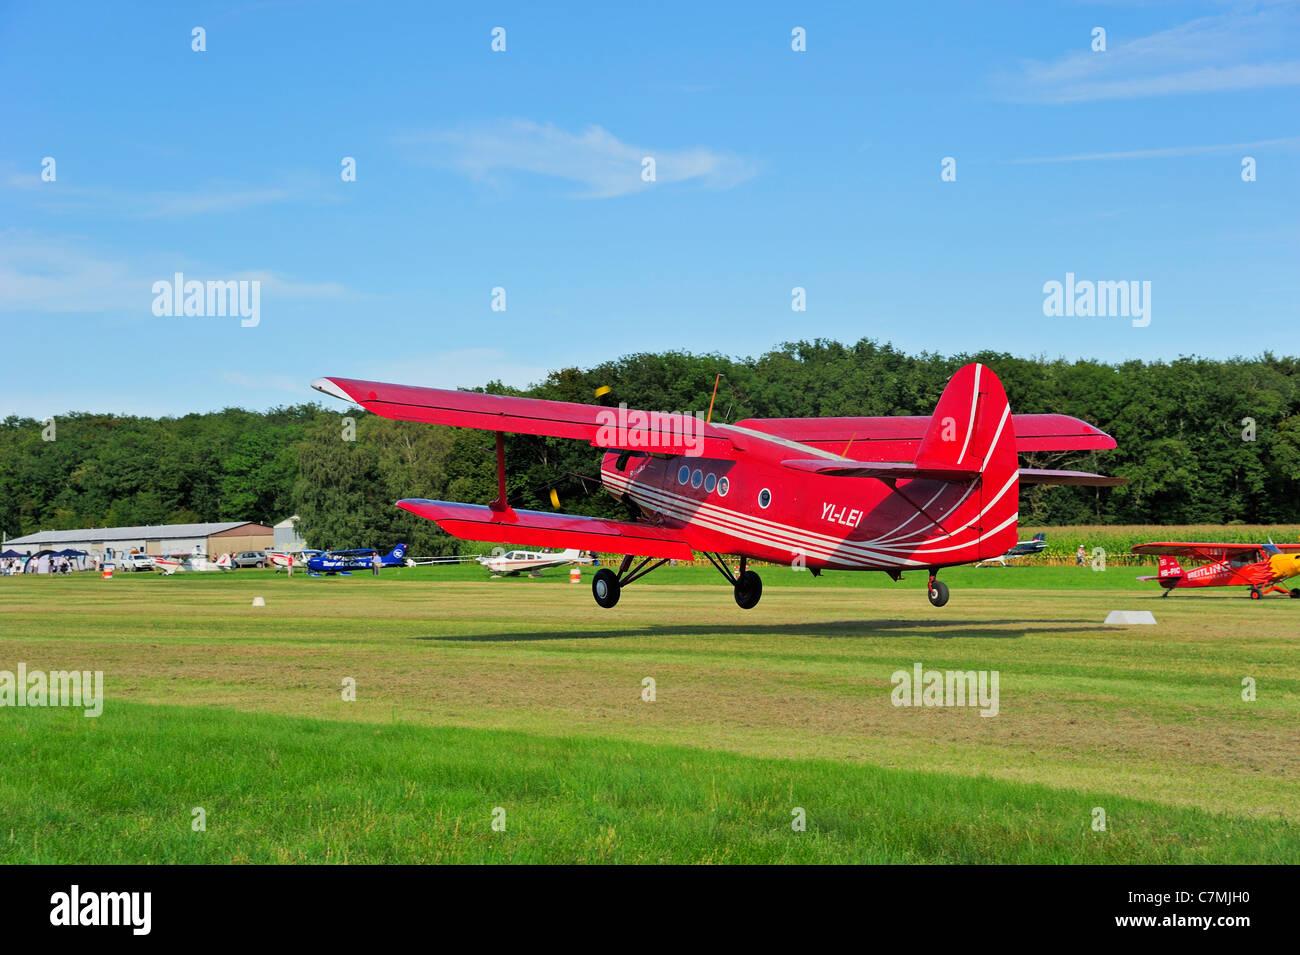 An Antonov AN-2 biplane landing on a grass airstrip. - Stock Image